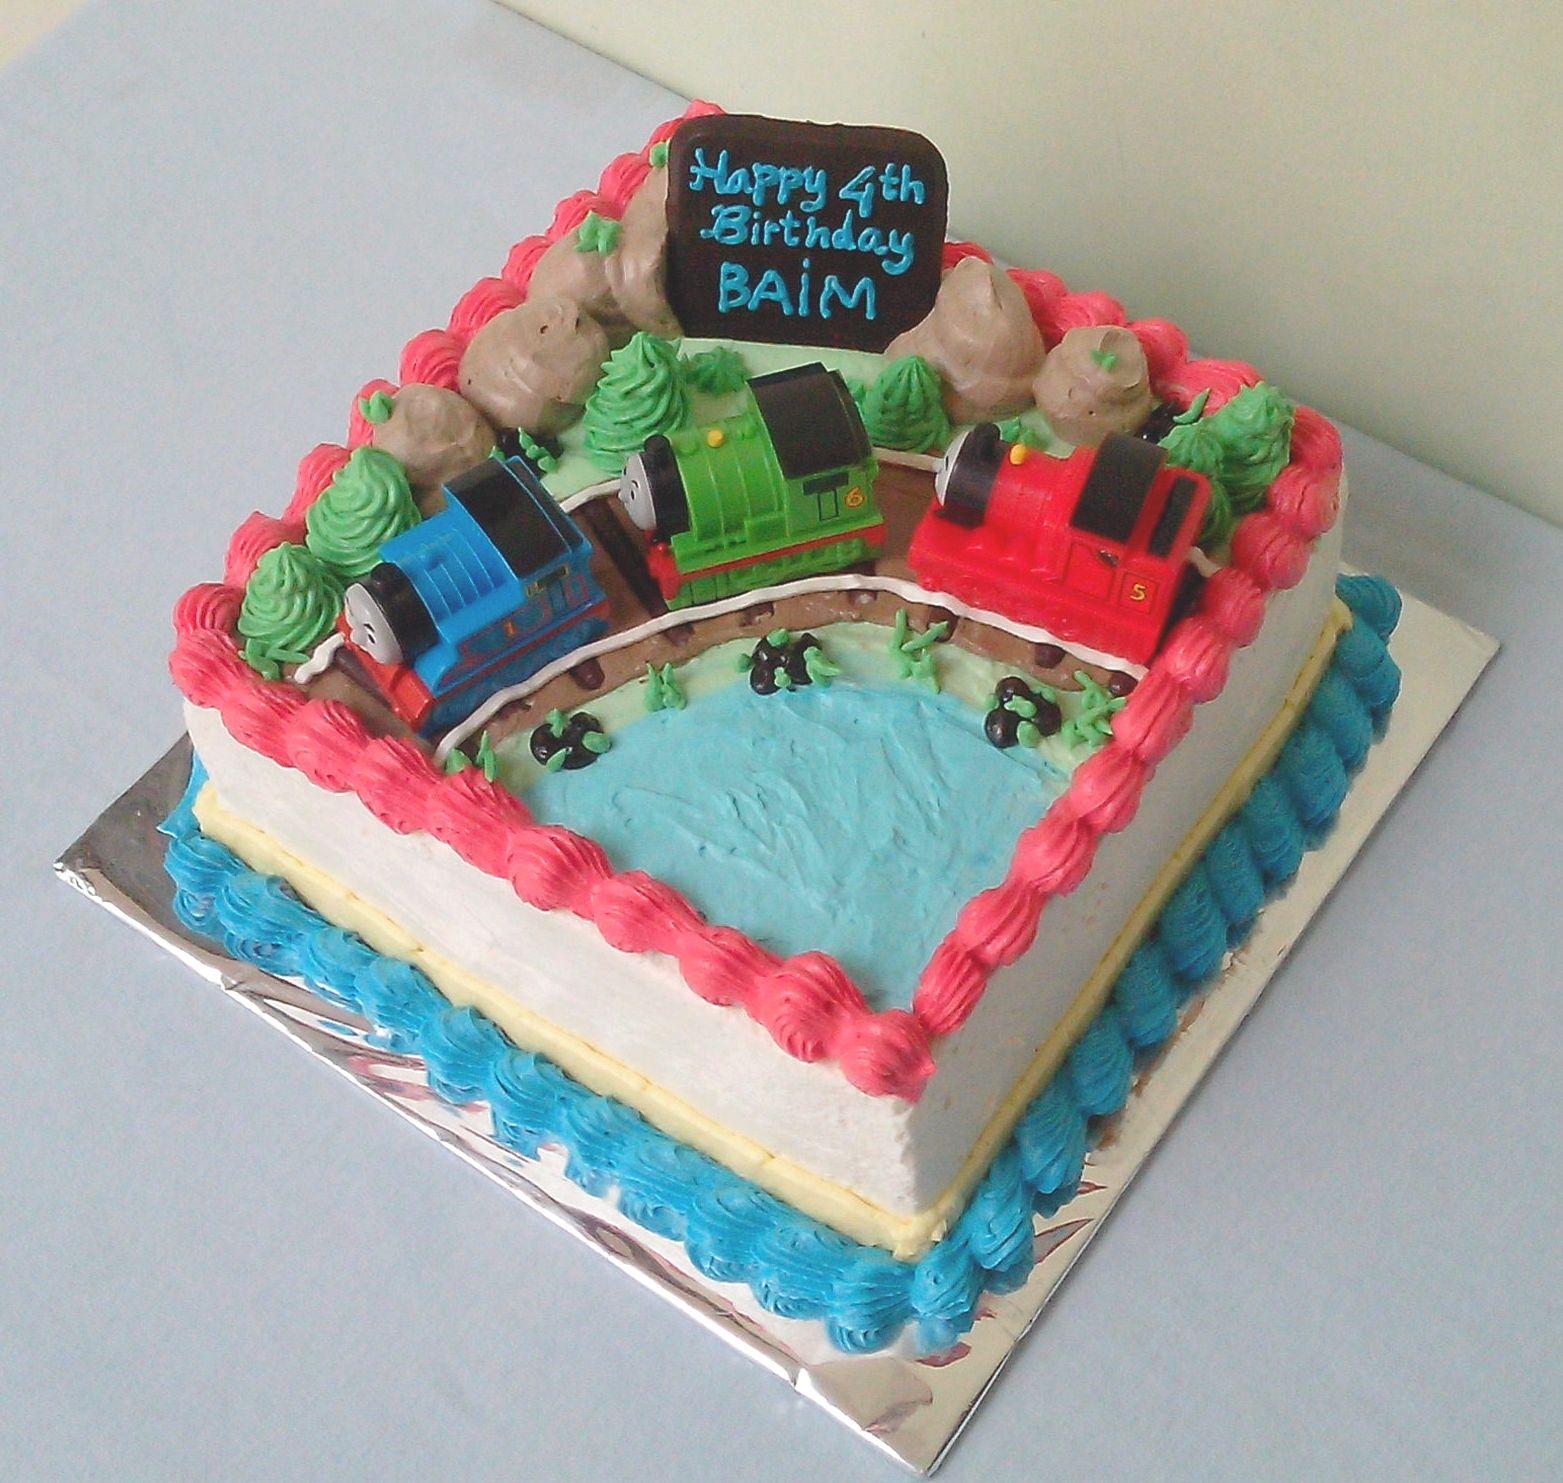 Thomas The Train Cake From Shoprite